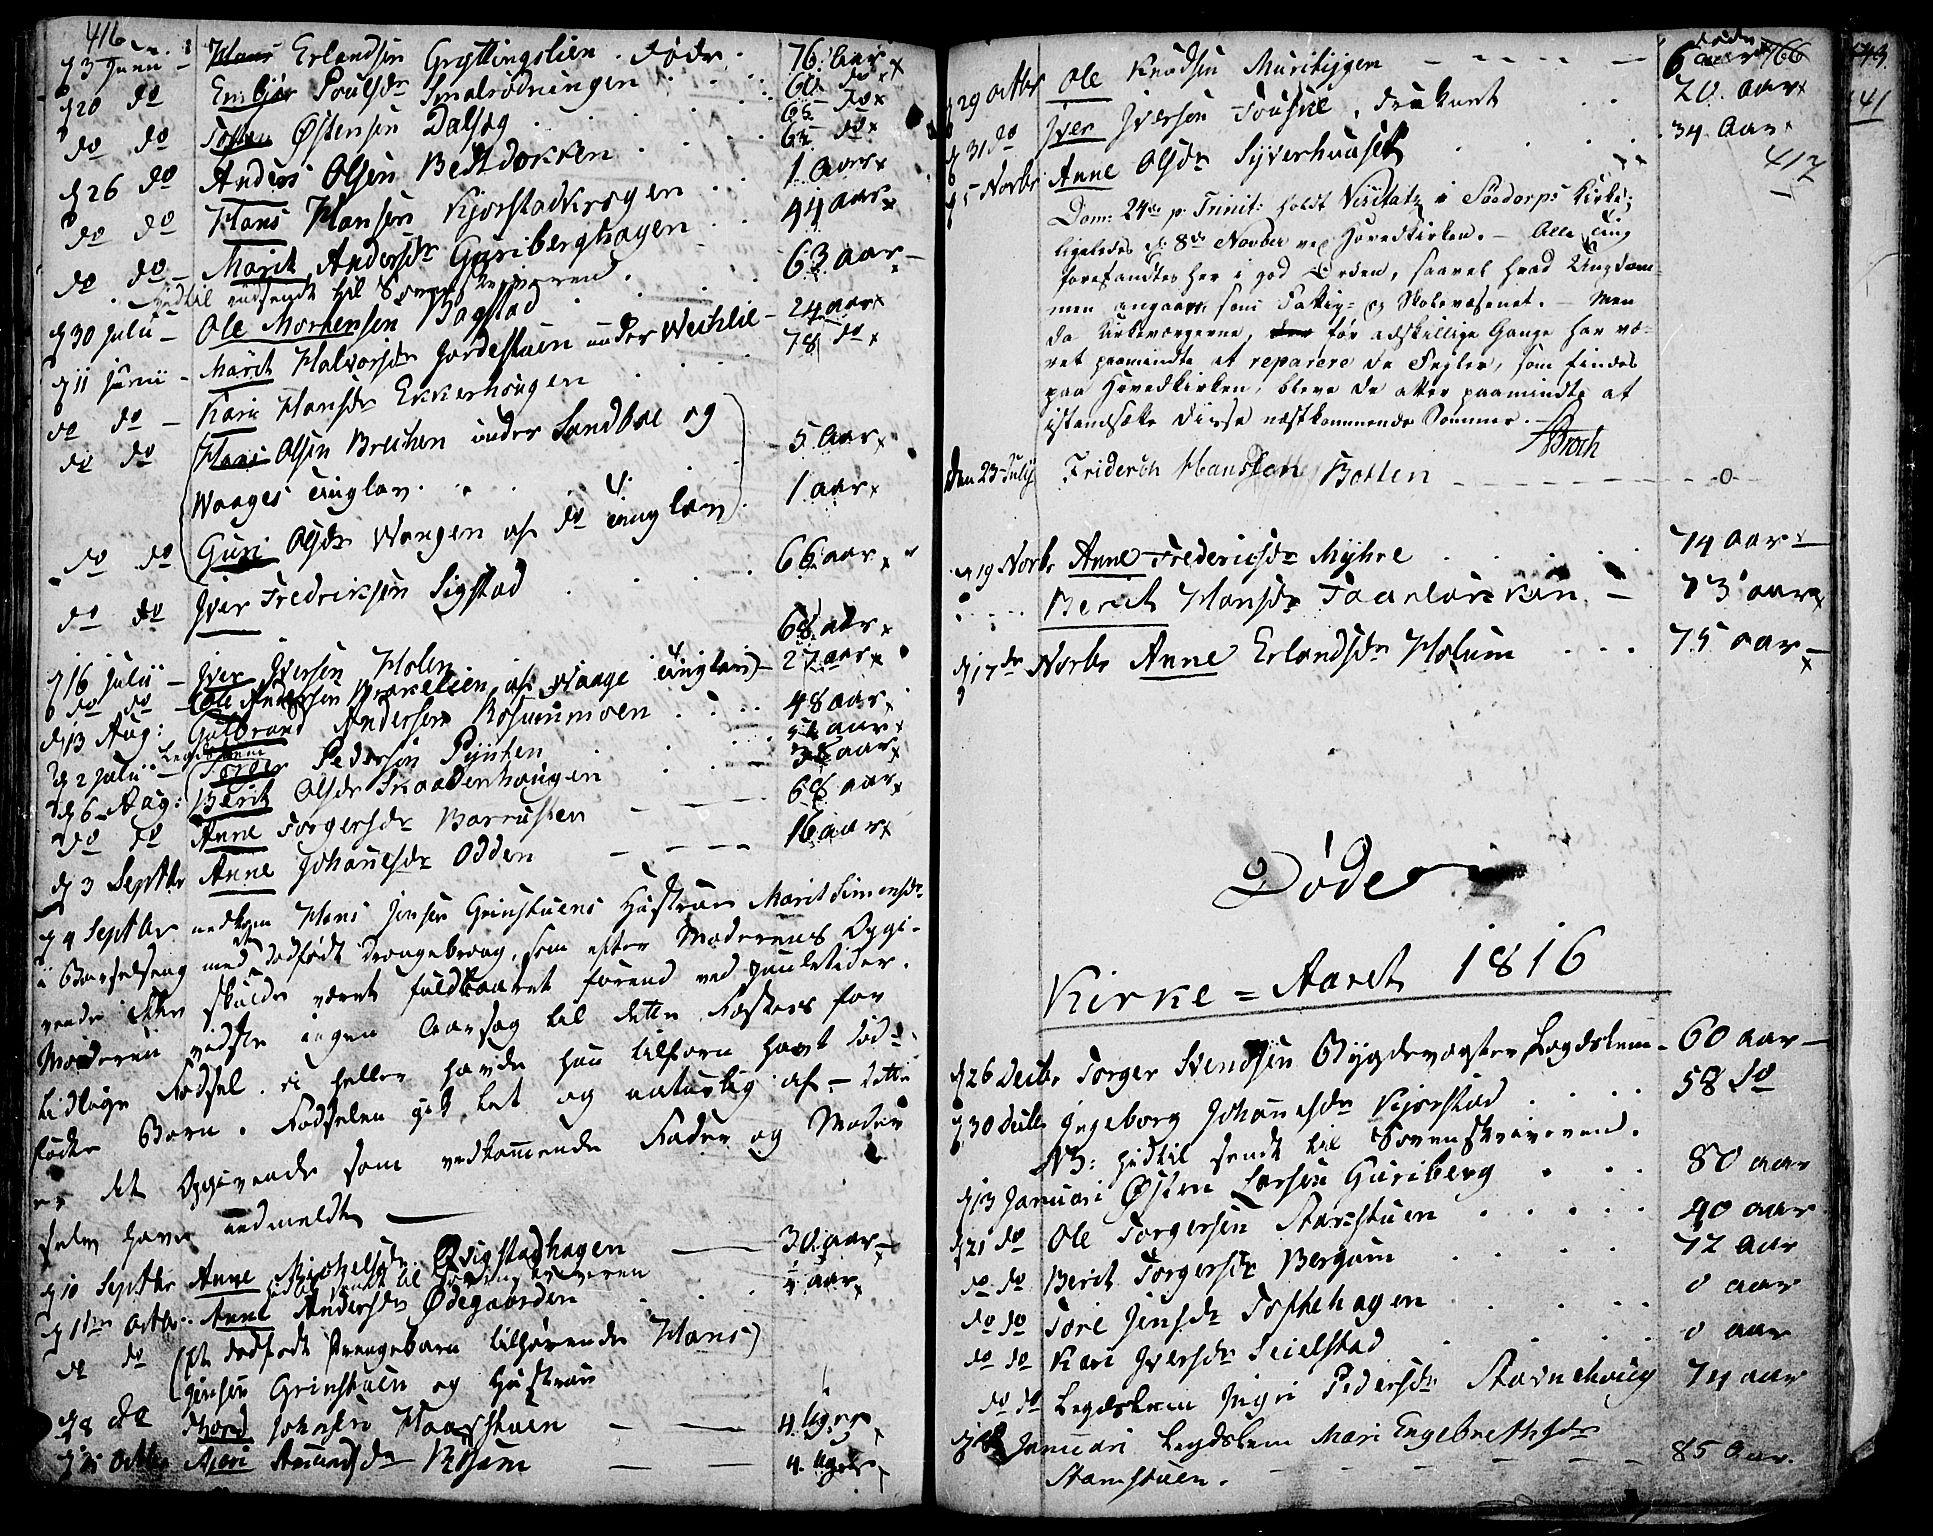 SAH, Fron prestekontor, H/Ha/Haa/L0001: Ministerialbok nr. 1, 1799-1816, s. 416-417